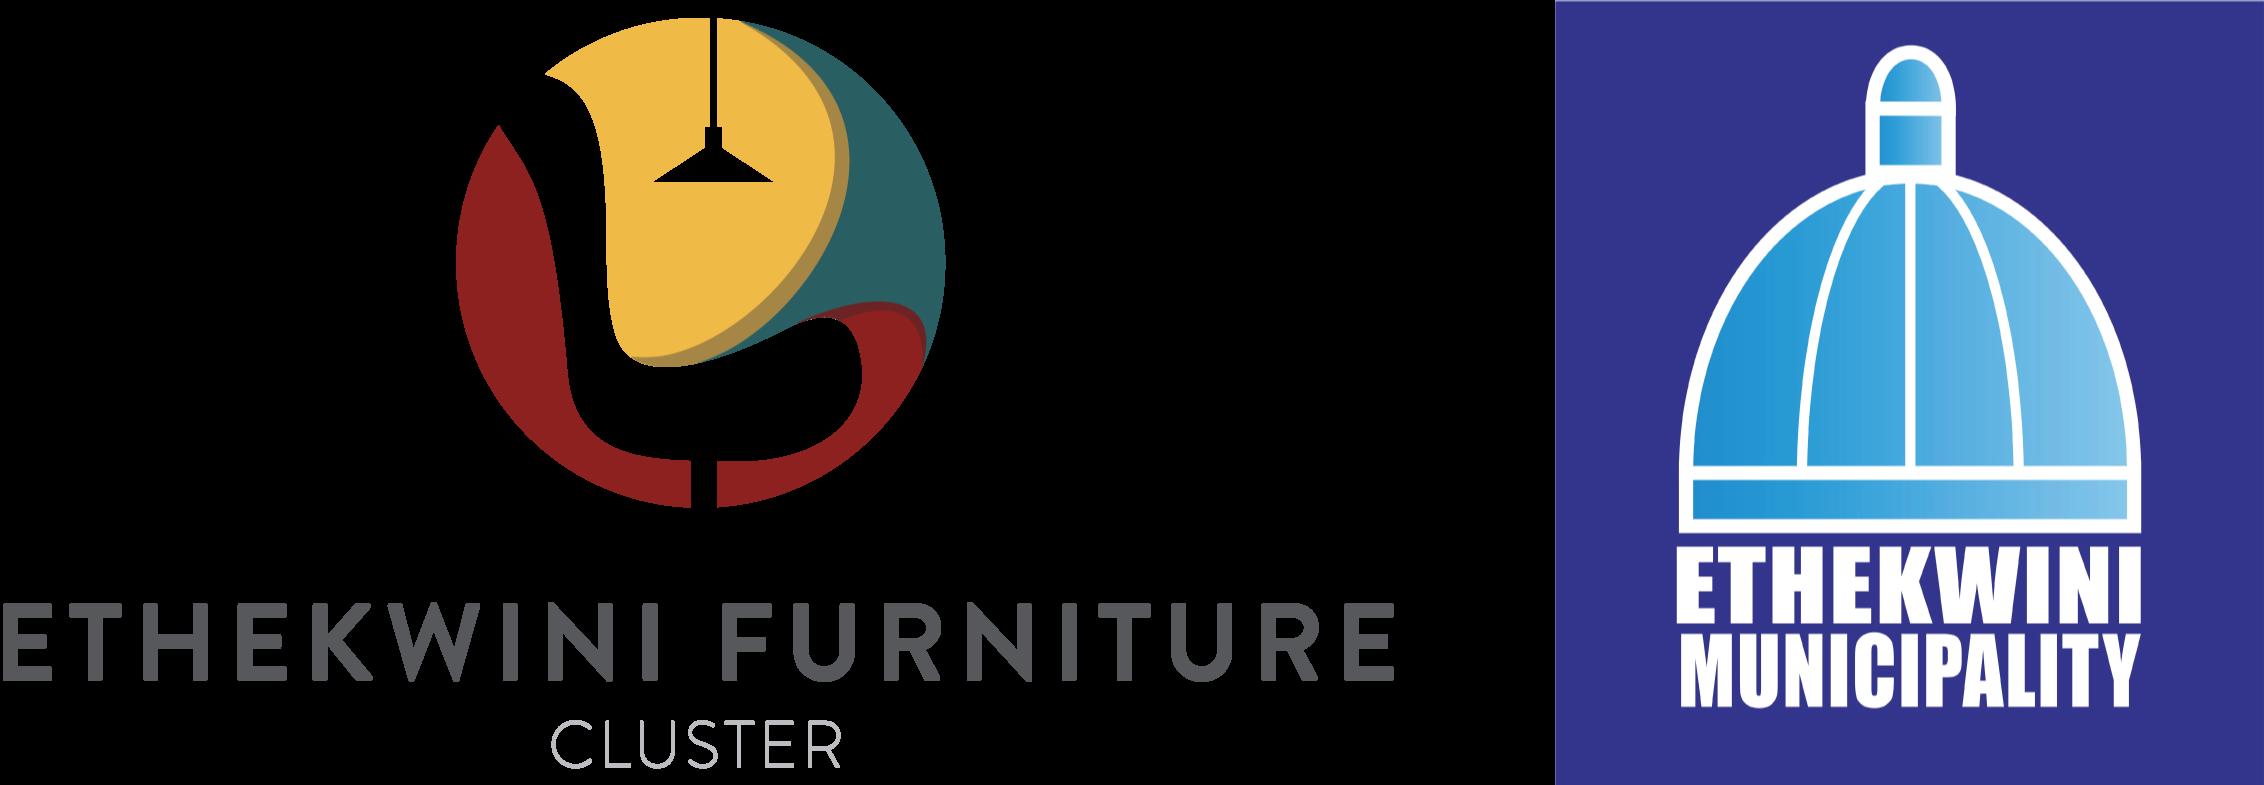 eThekwini Furniture Cluster